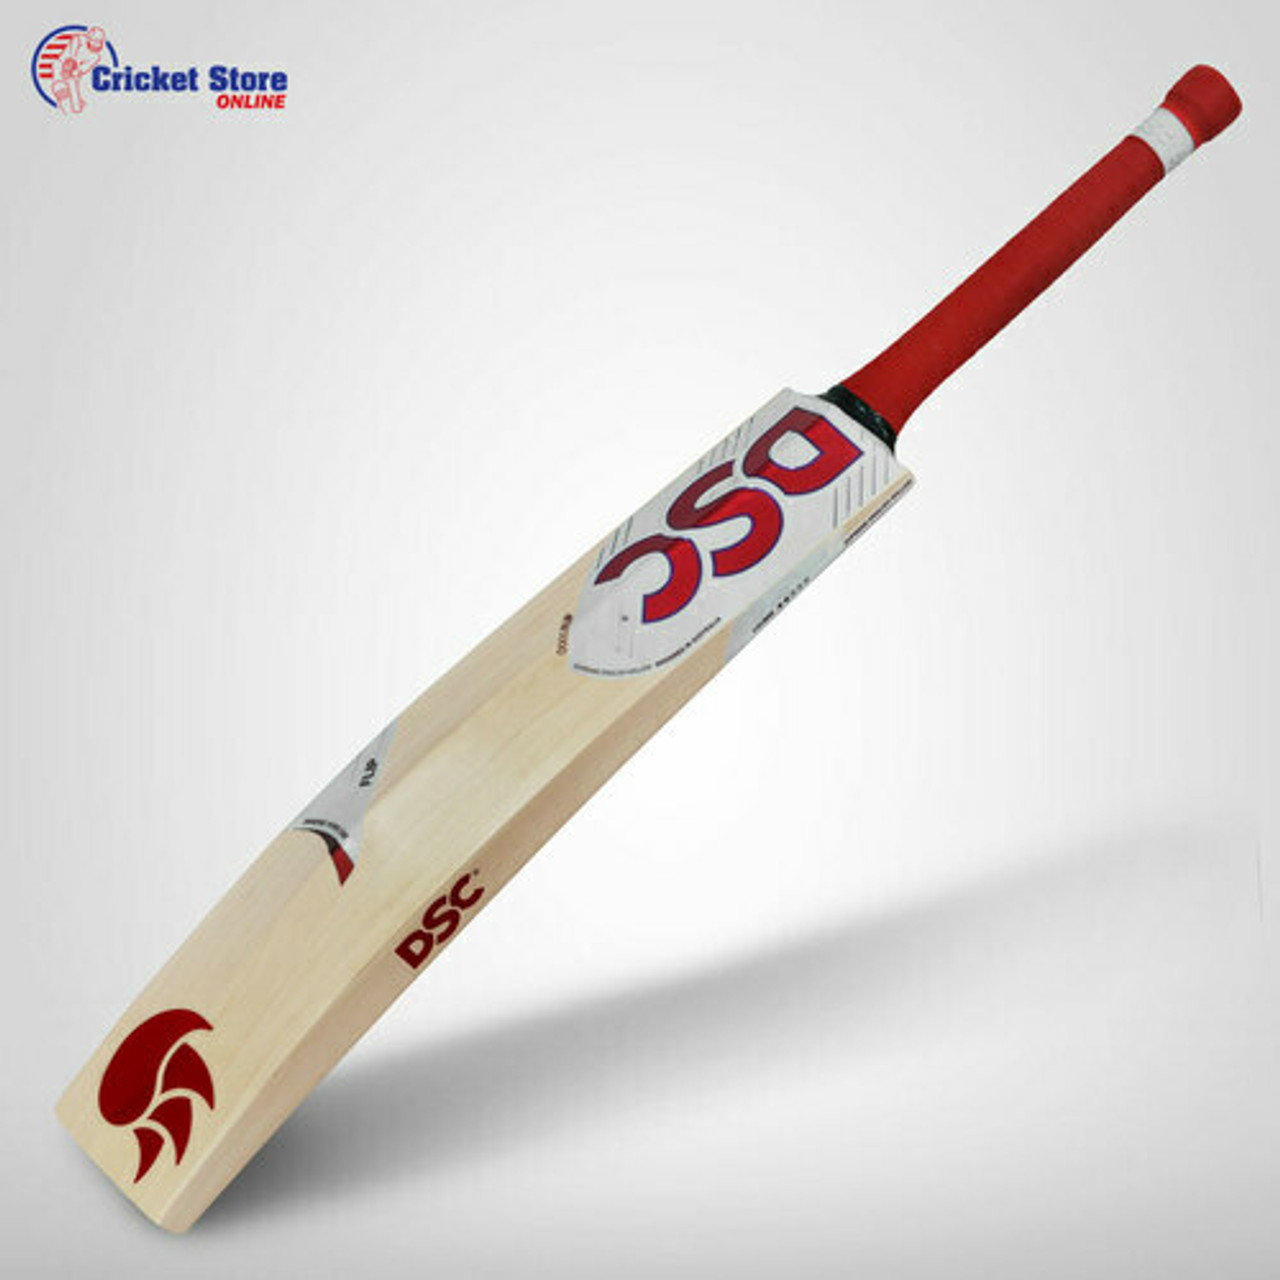 DSC Flip Cricket Bats 2021